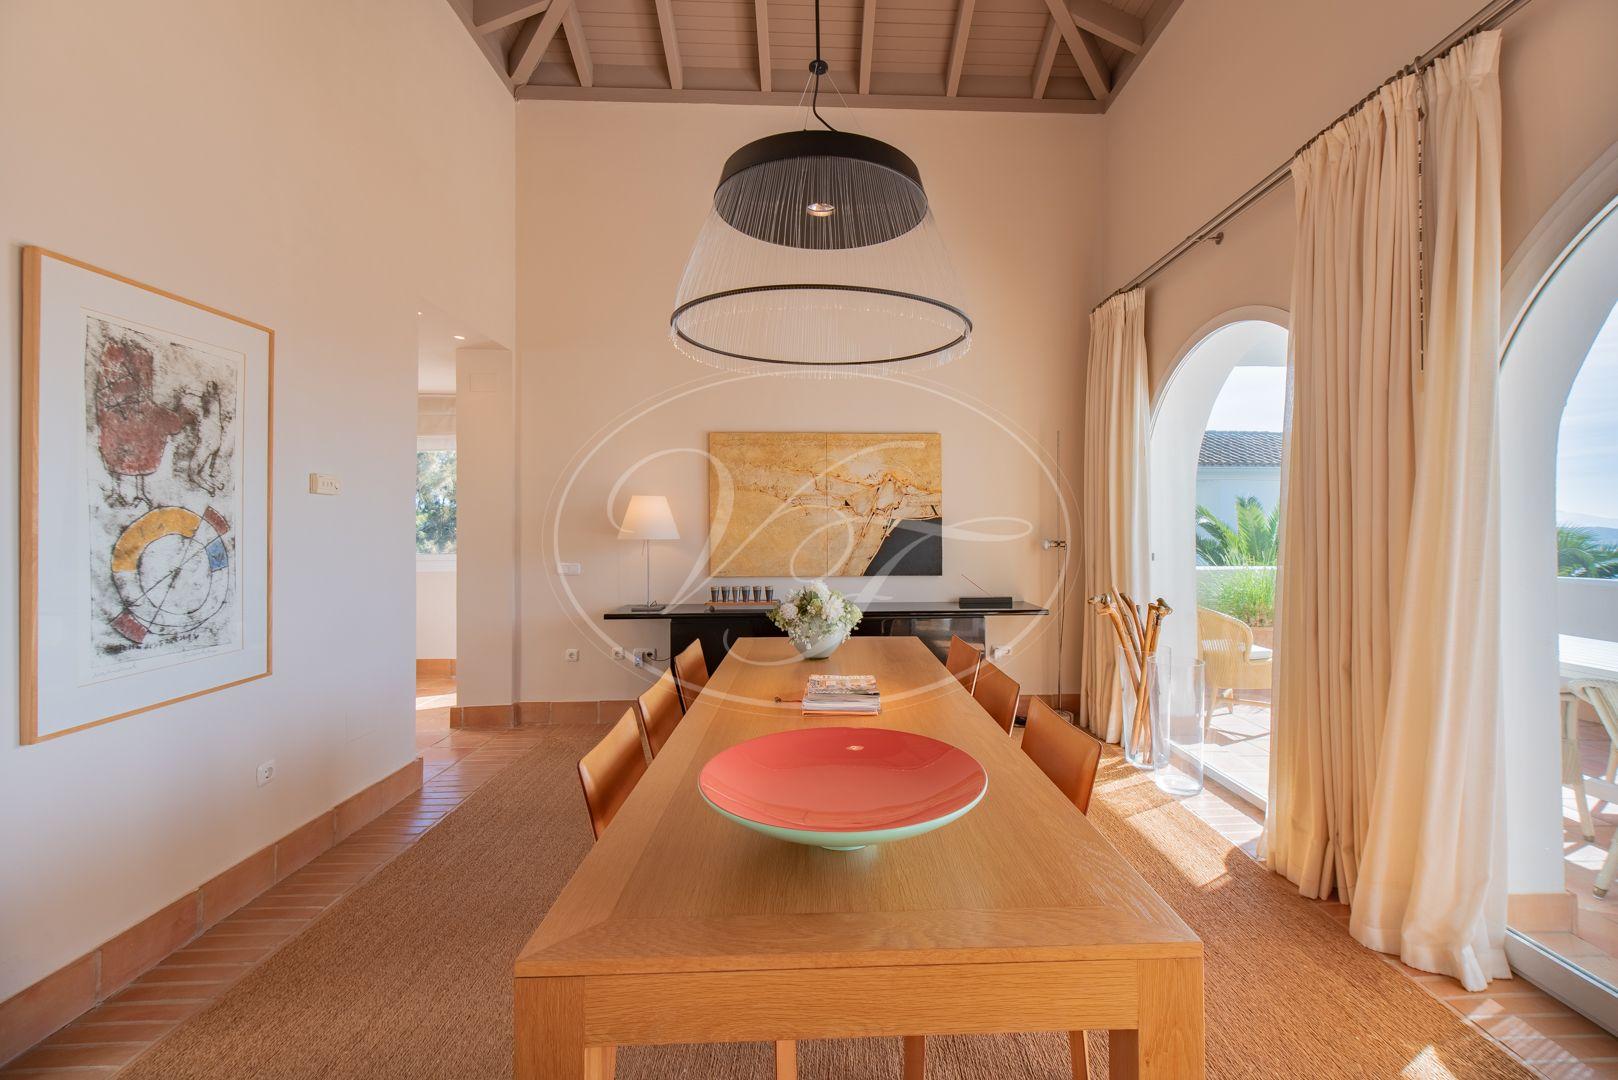 Villa for sale in Benalup - Casas Viejas